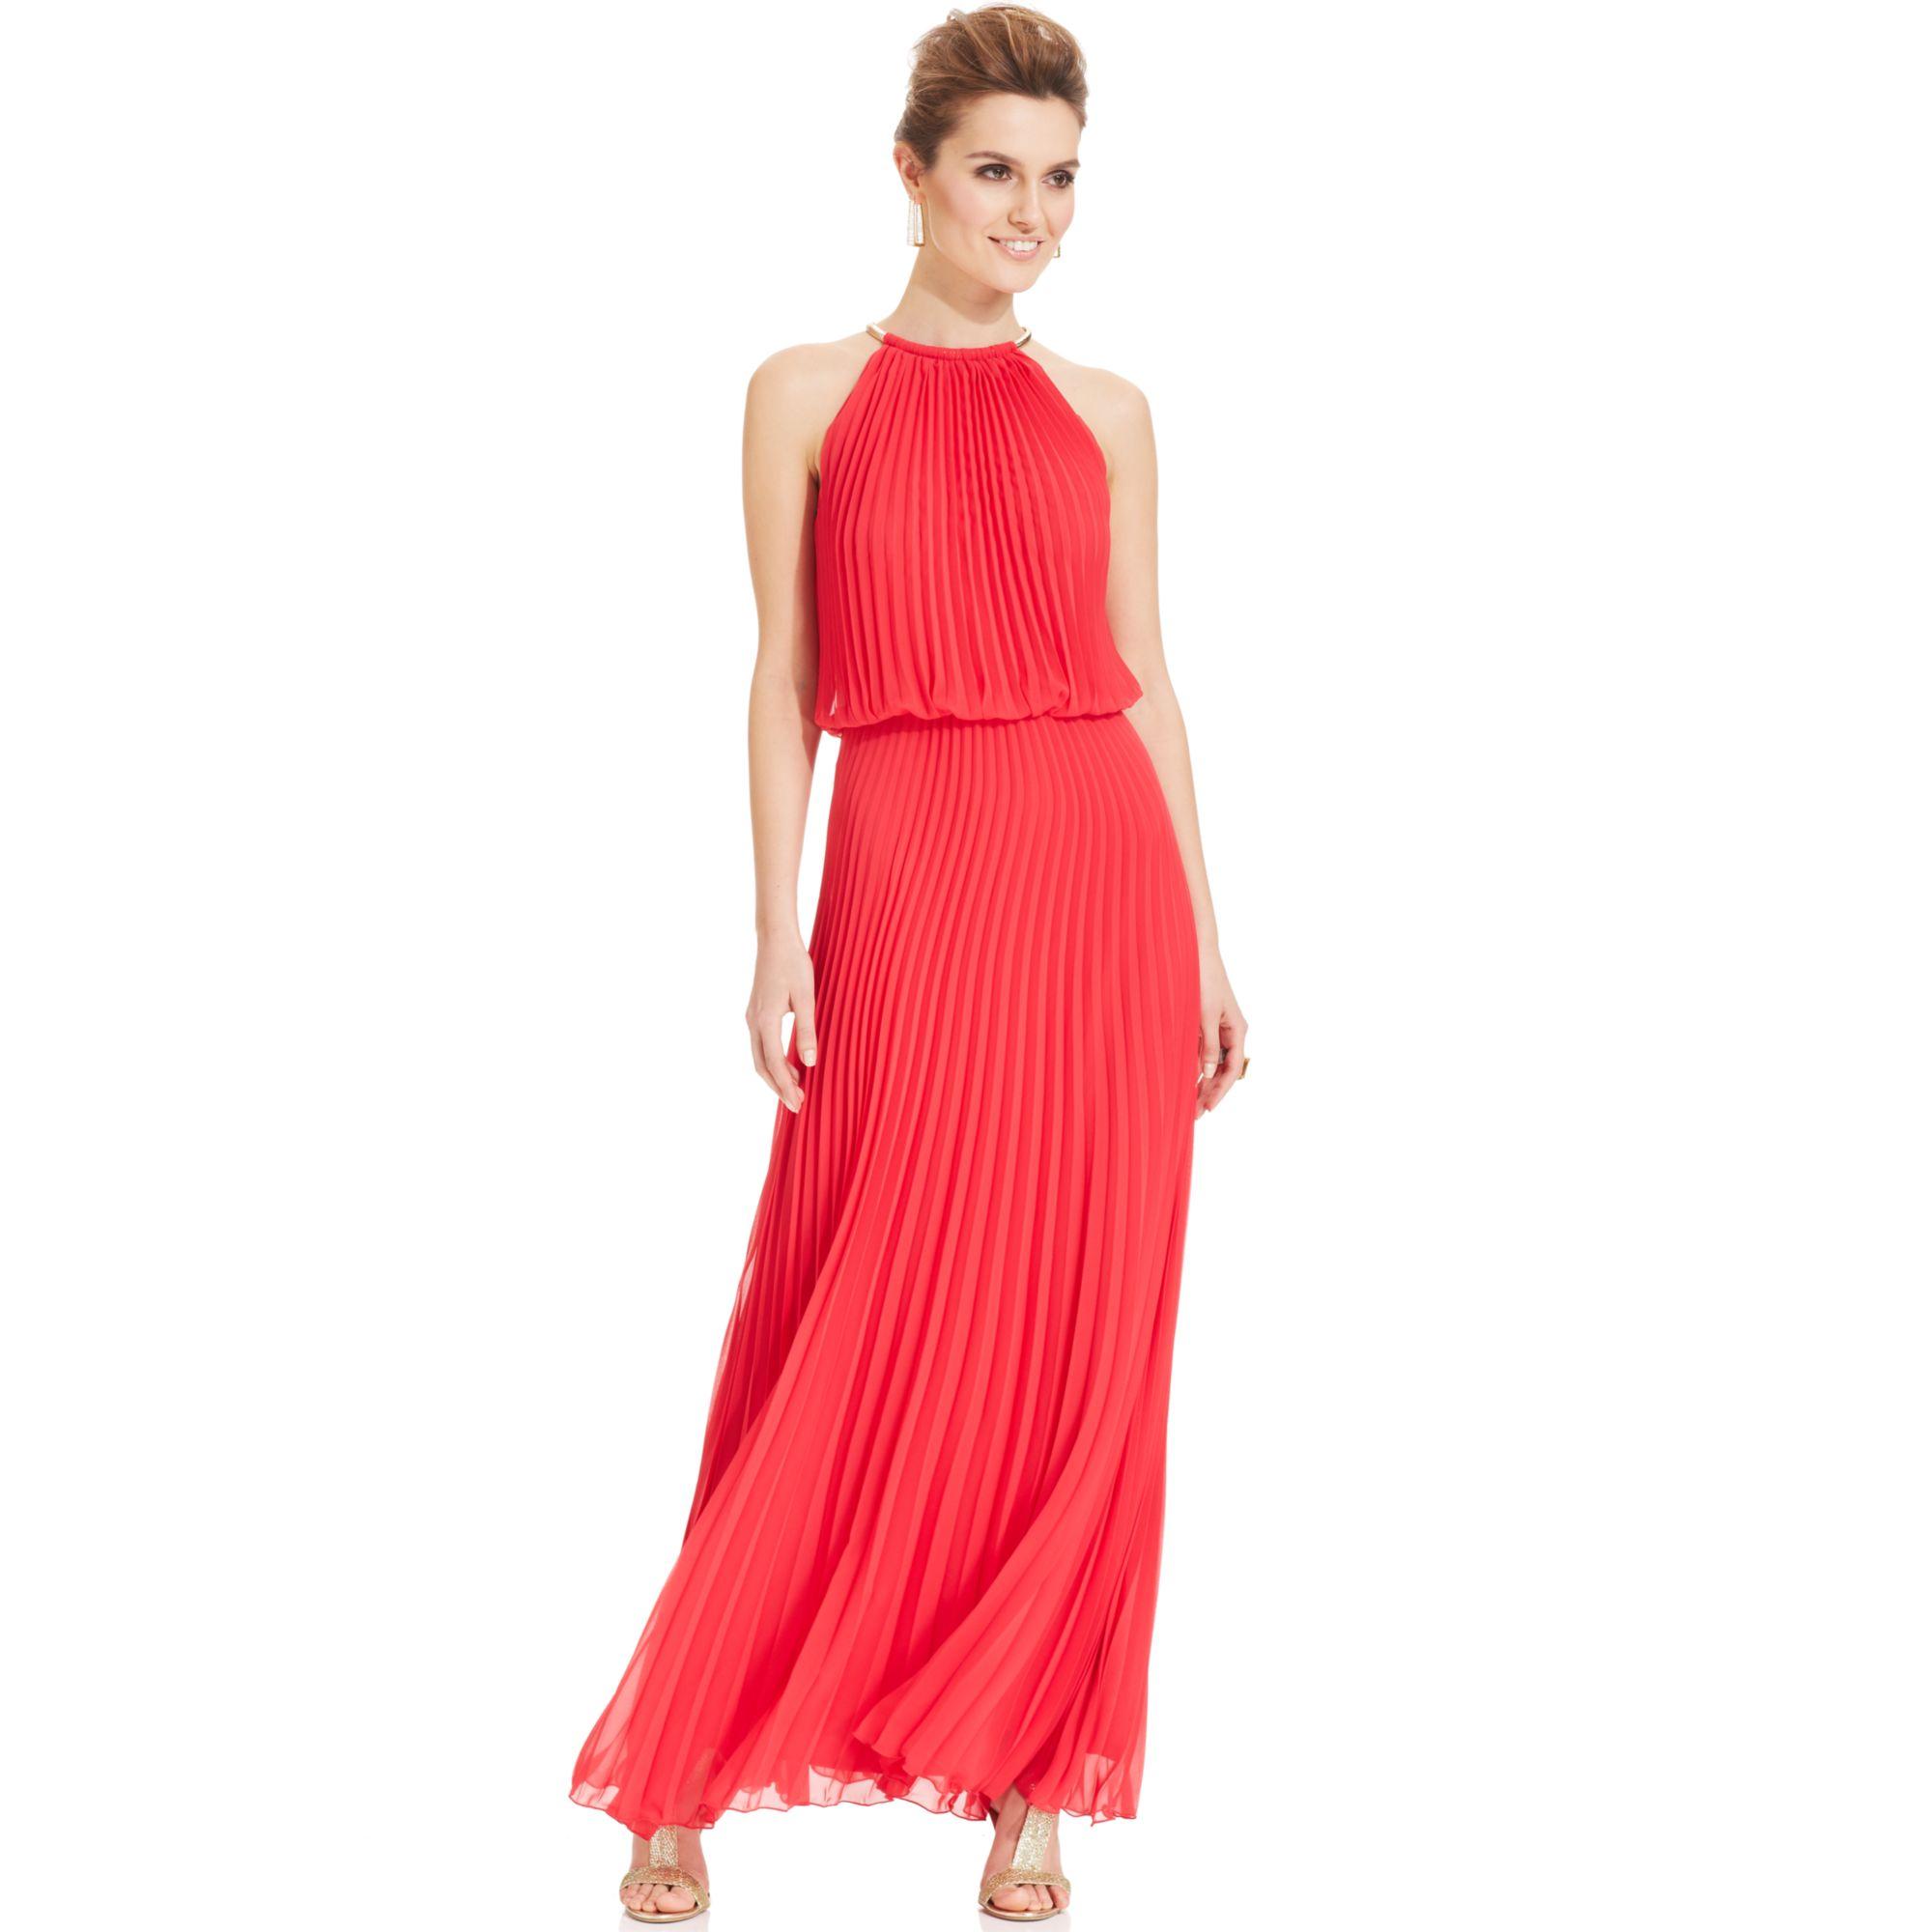 Lyst - Xscape Pleated Halter Blouson Gown in Orange